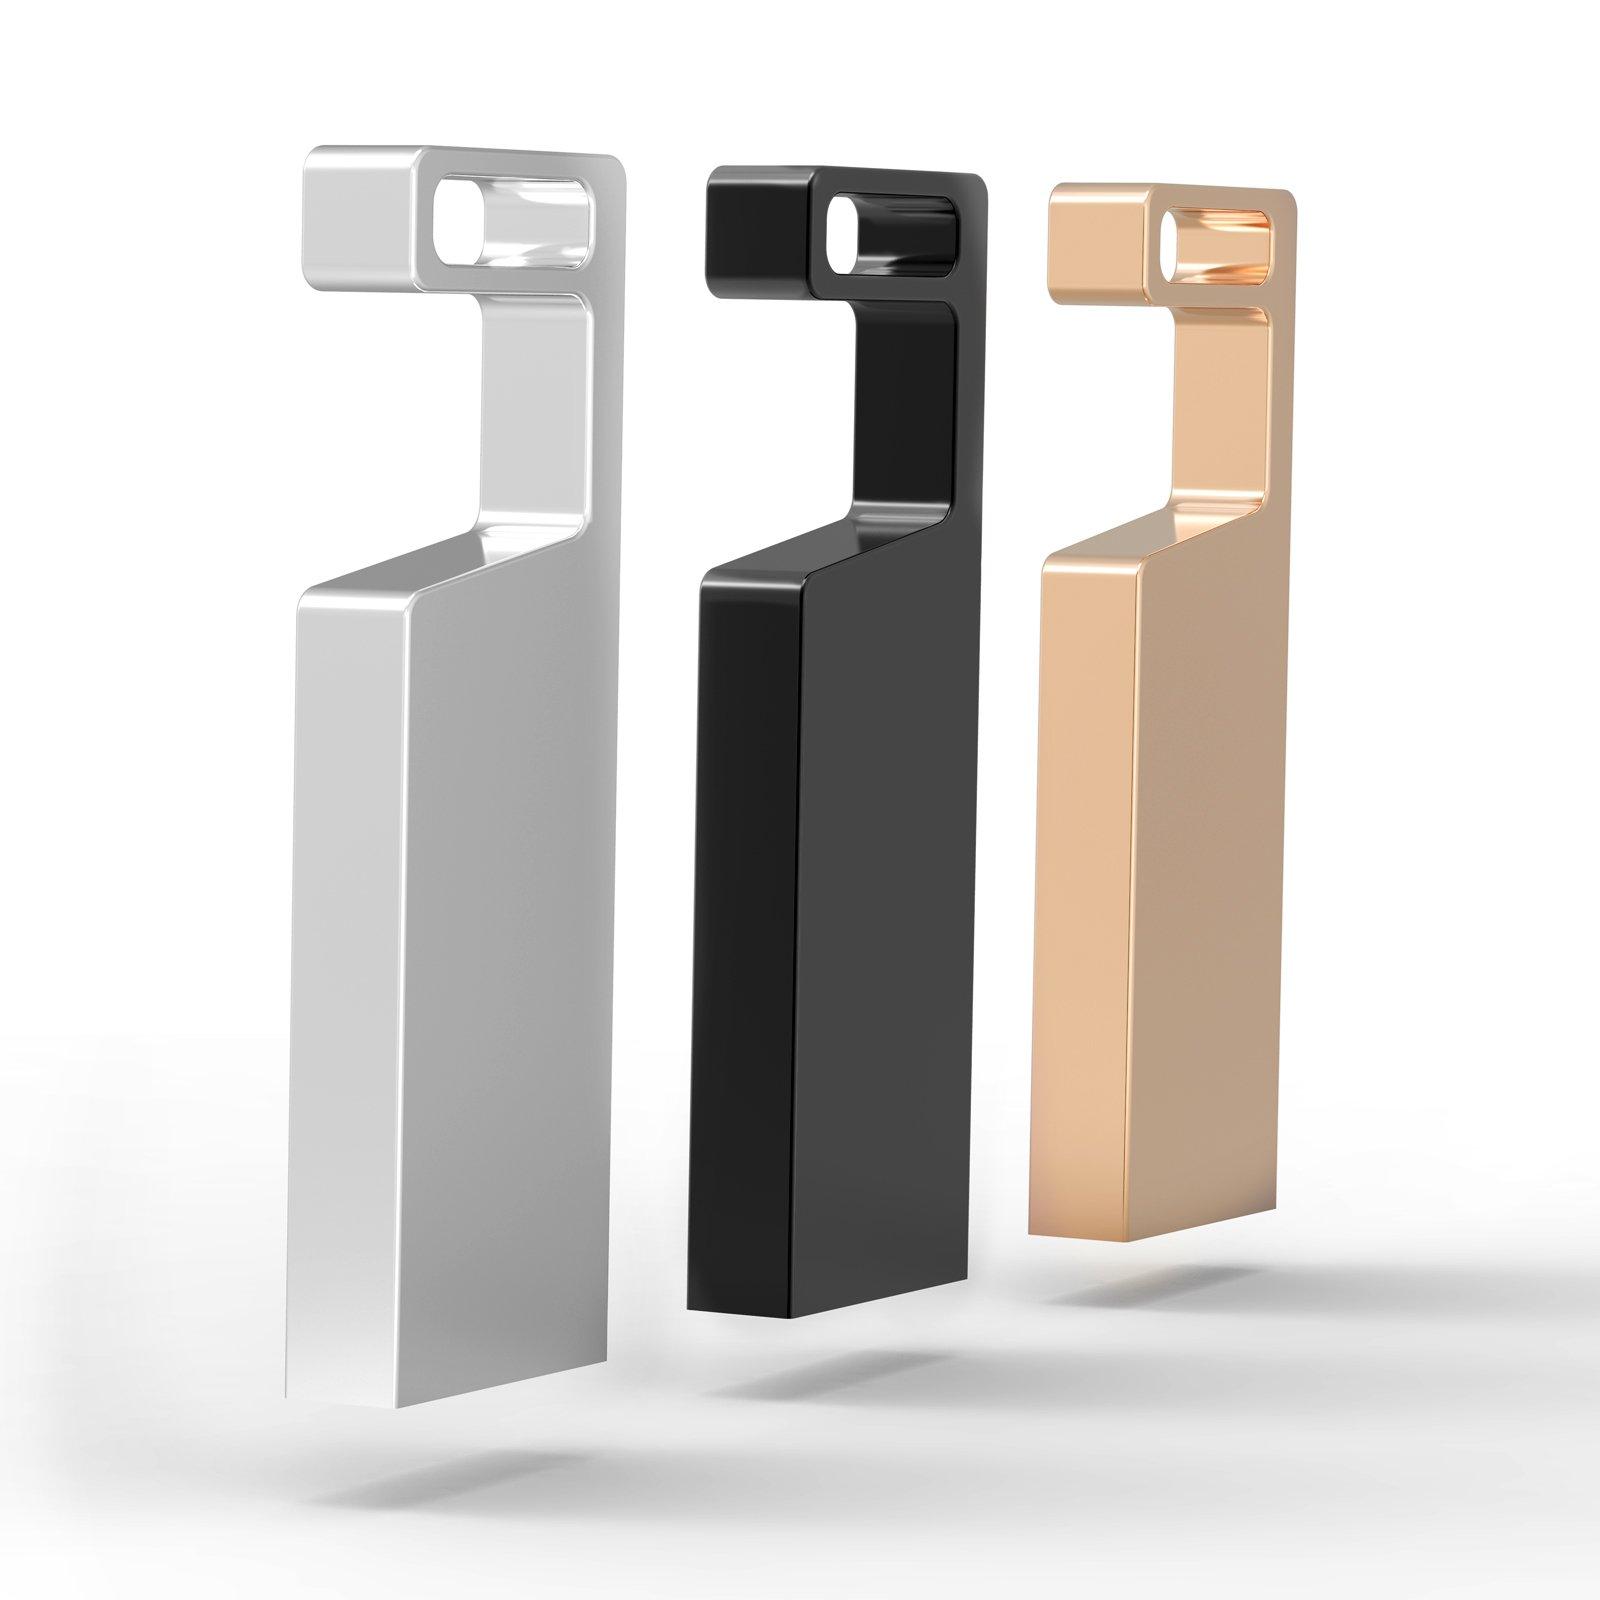 KEXIN 3pcs 32GB USB 3.0 Flash Drives Waterproof Metal Memory Stick Mobile Phone Holder Design USB Drive Thumb Drive (3 Mixed Colors: Black Gold Metallic)